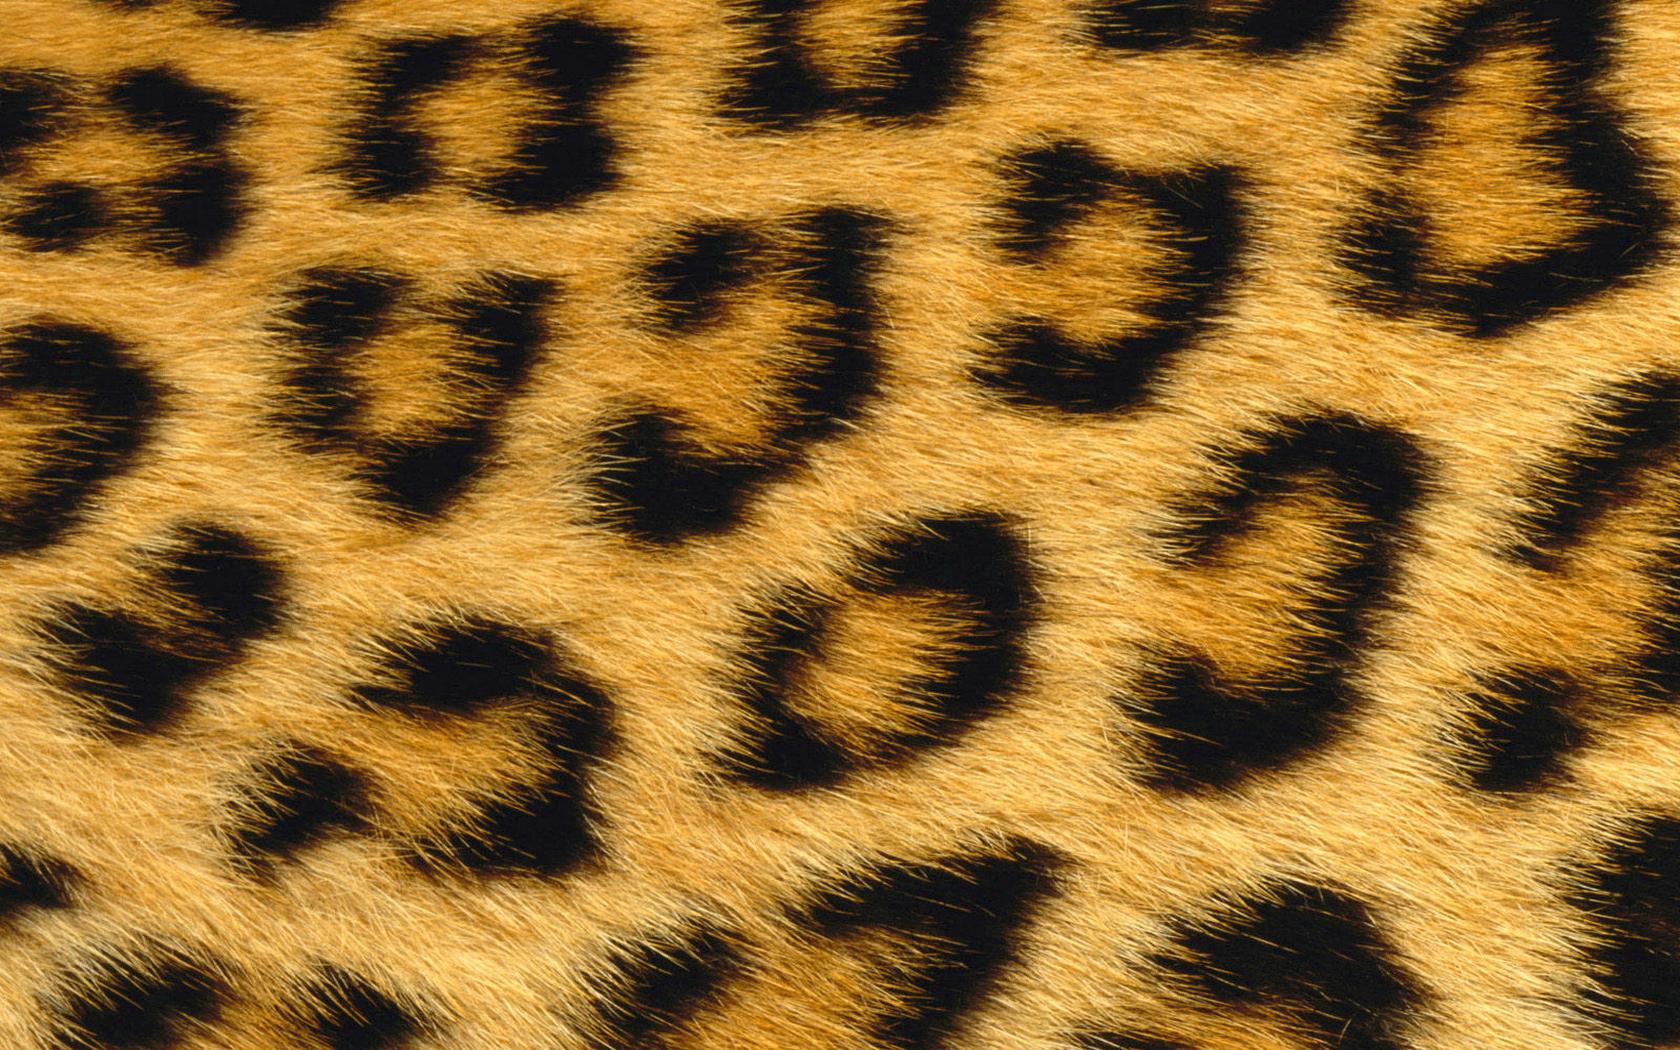 Free Leopard Skin 1680x1050 Wallpaper